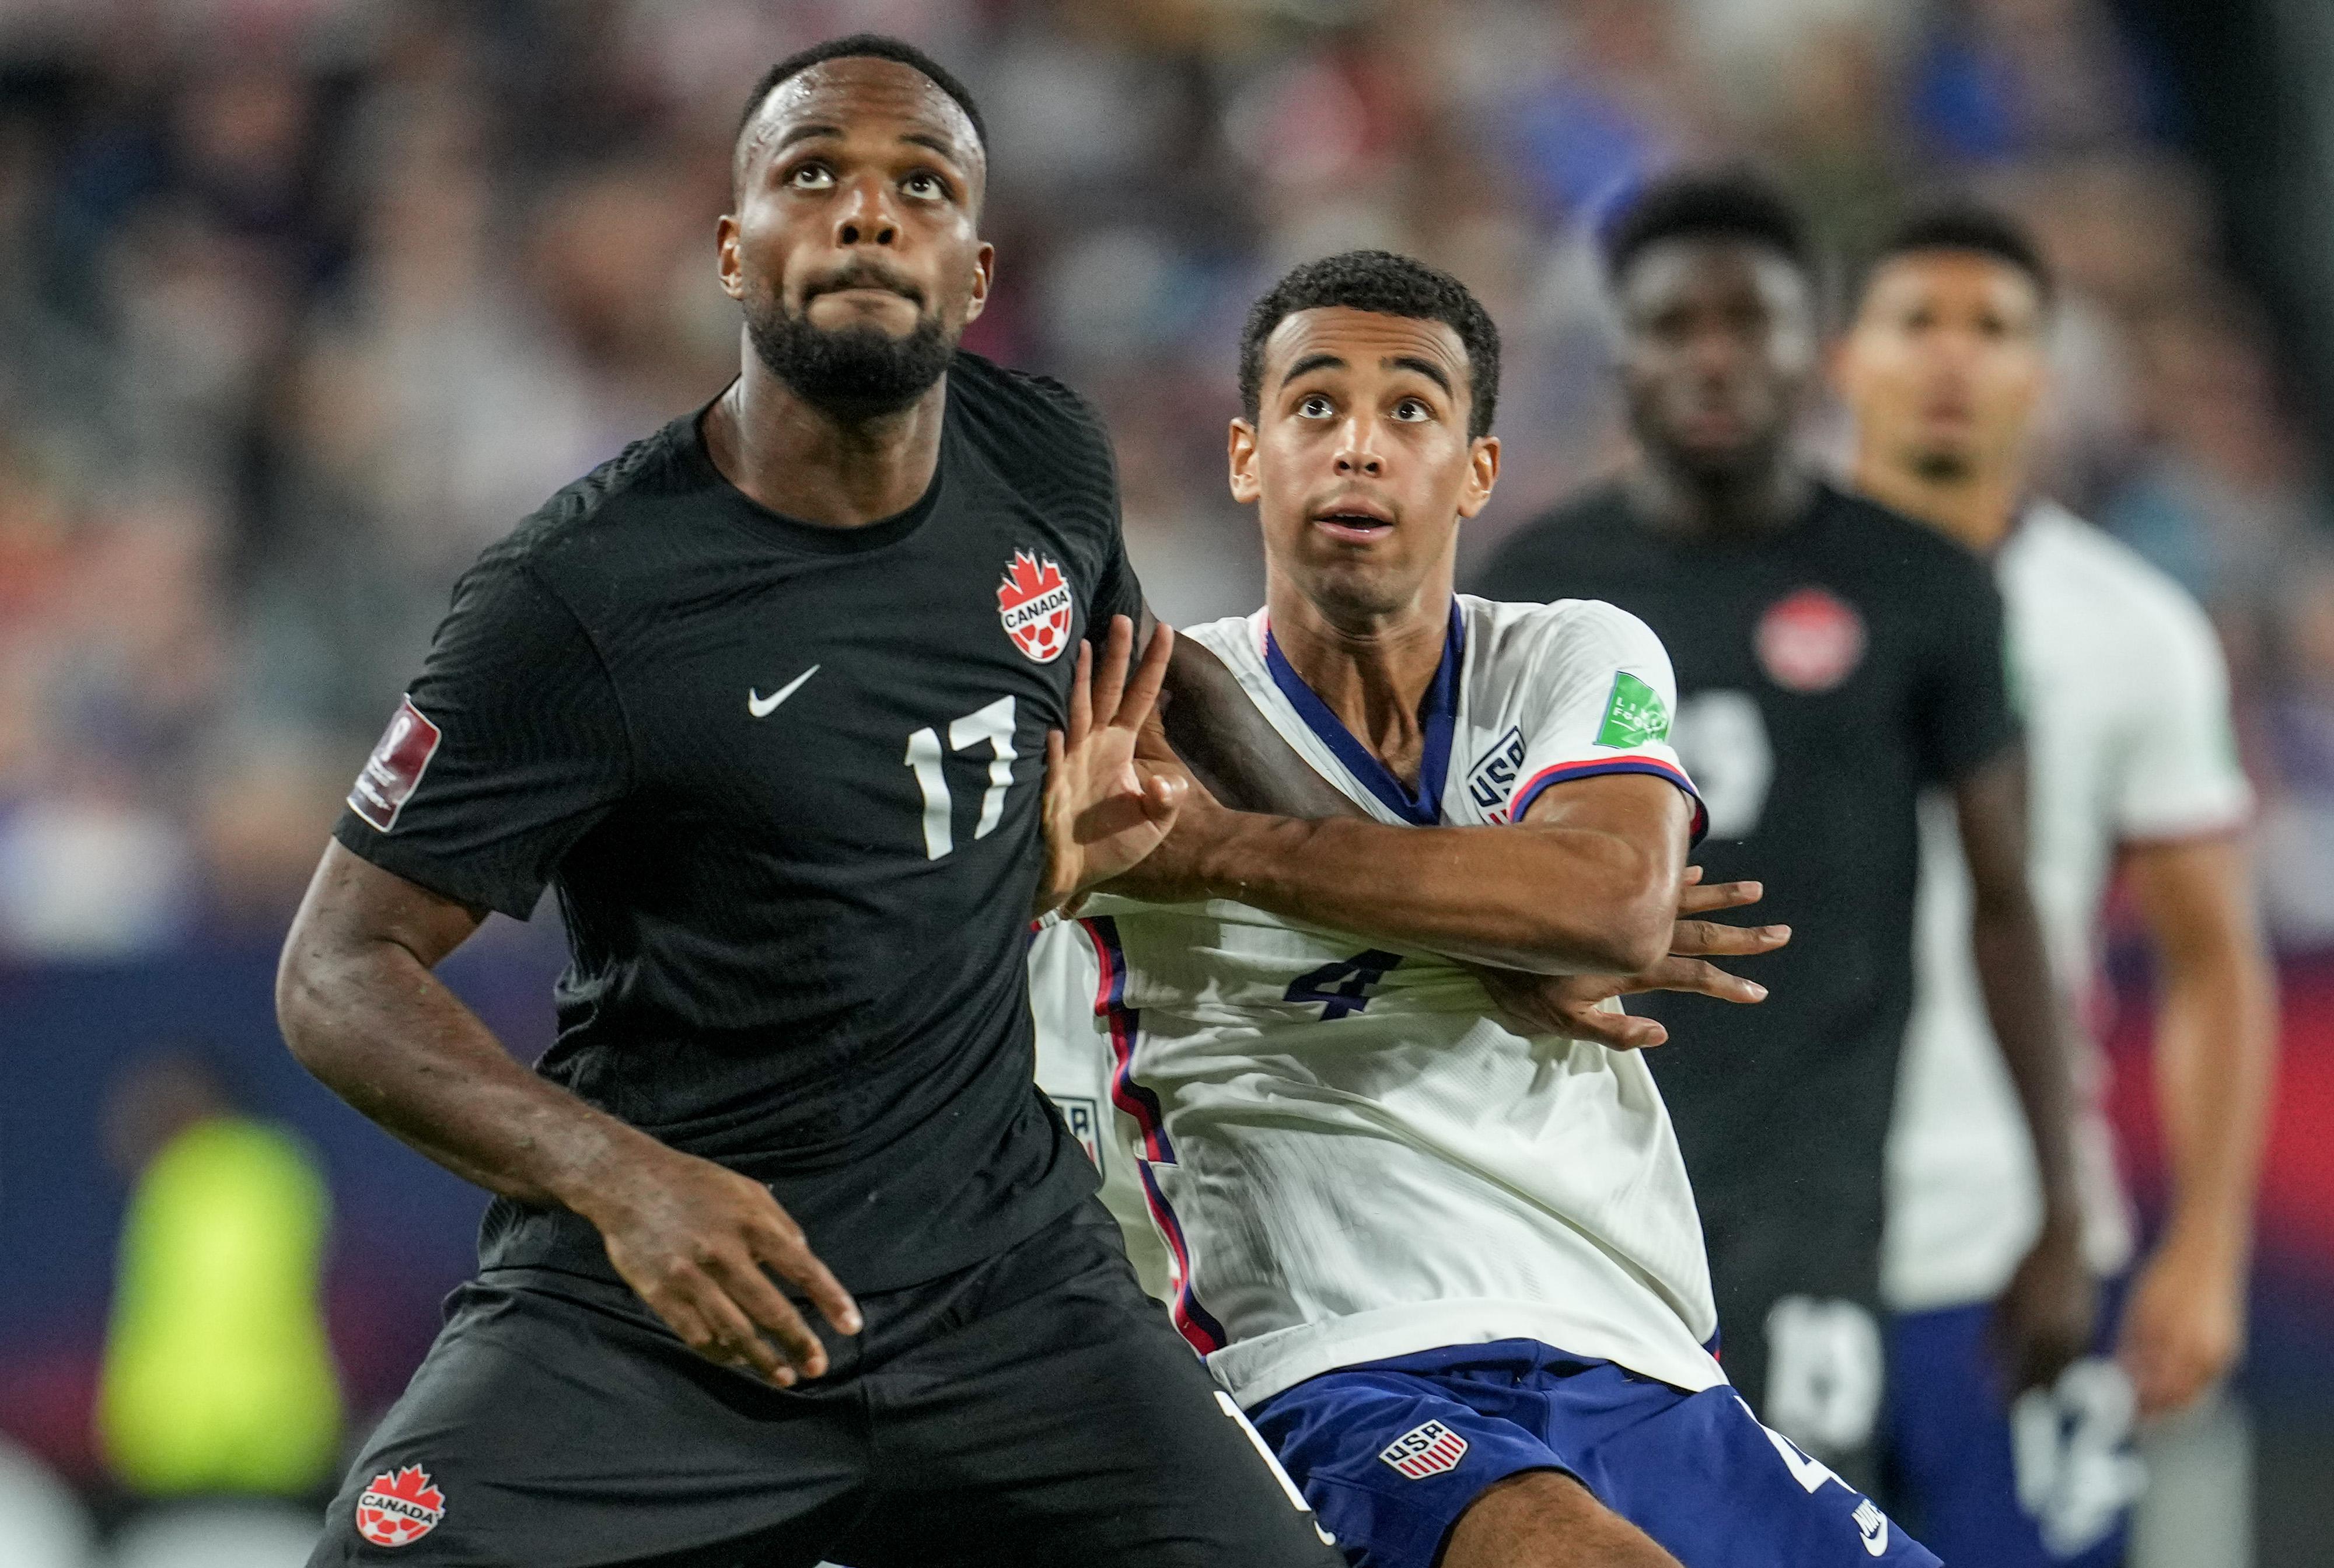 Canada v United States: 2022 World Cup Qualifying